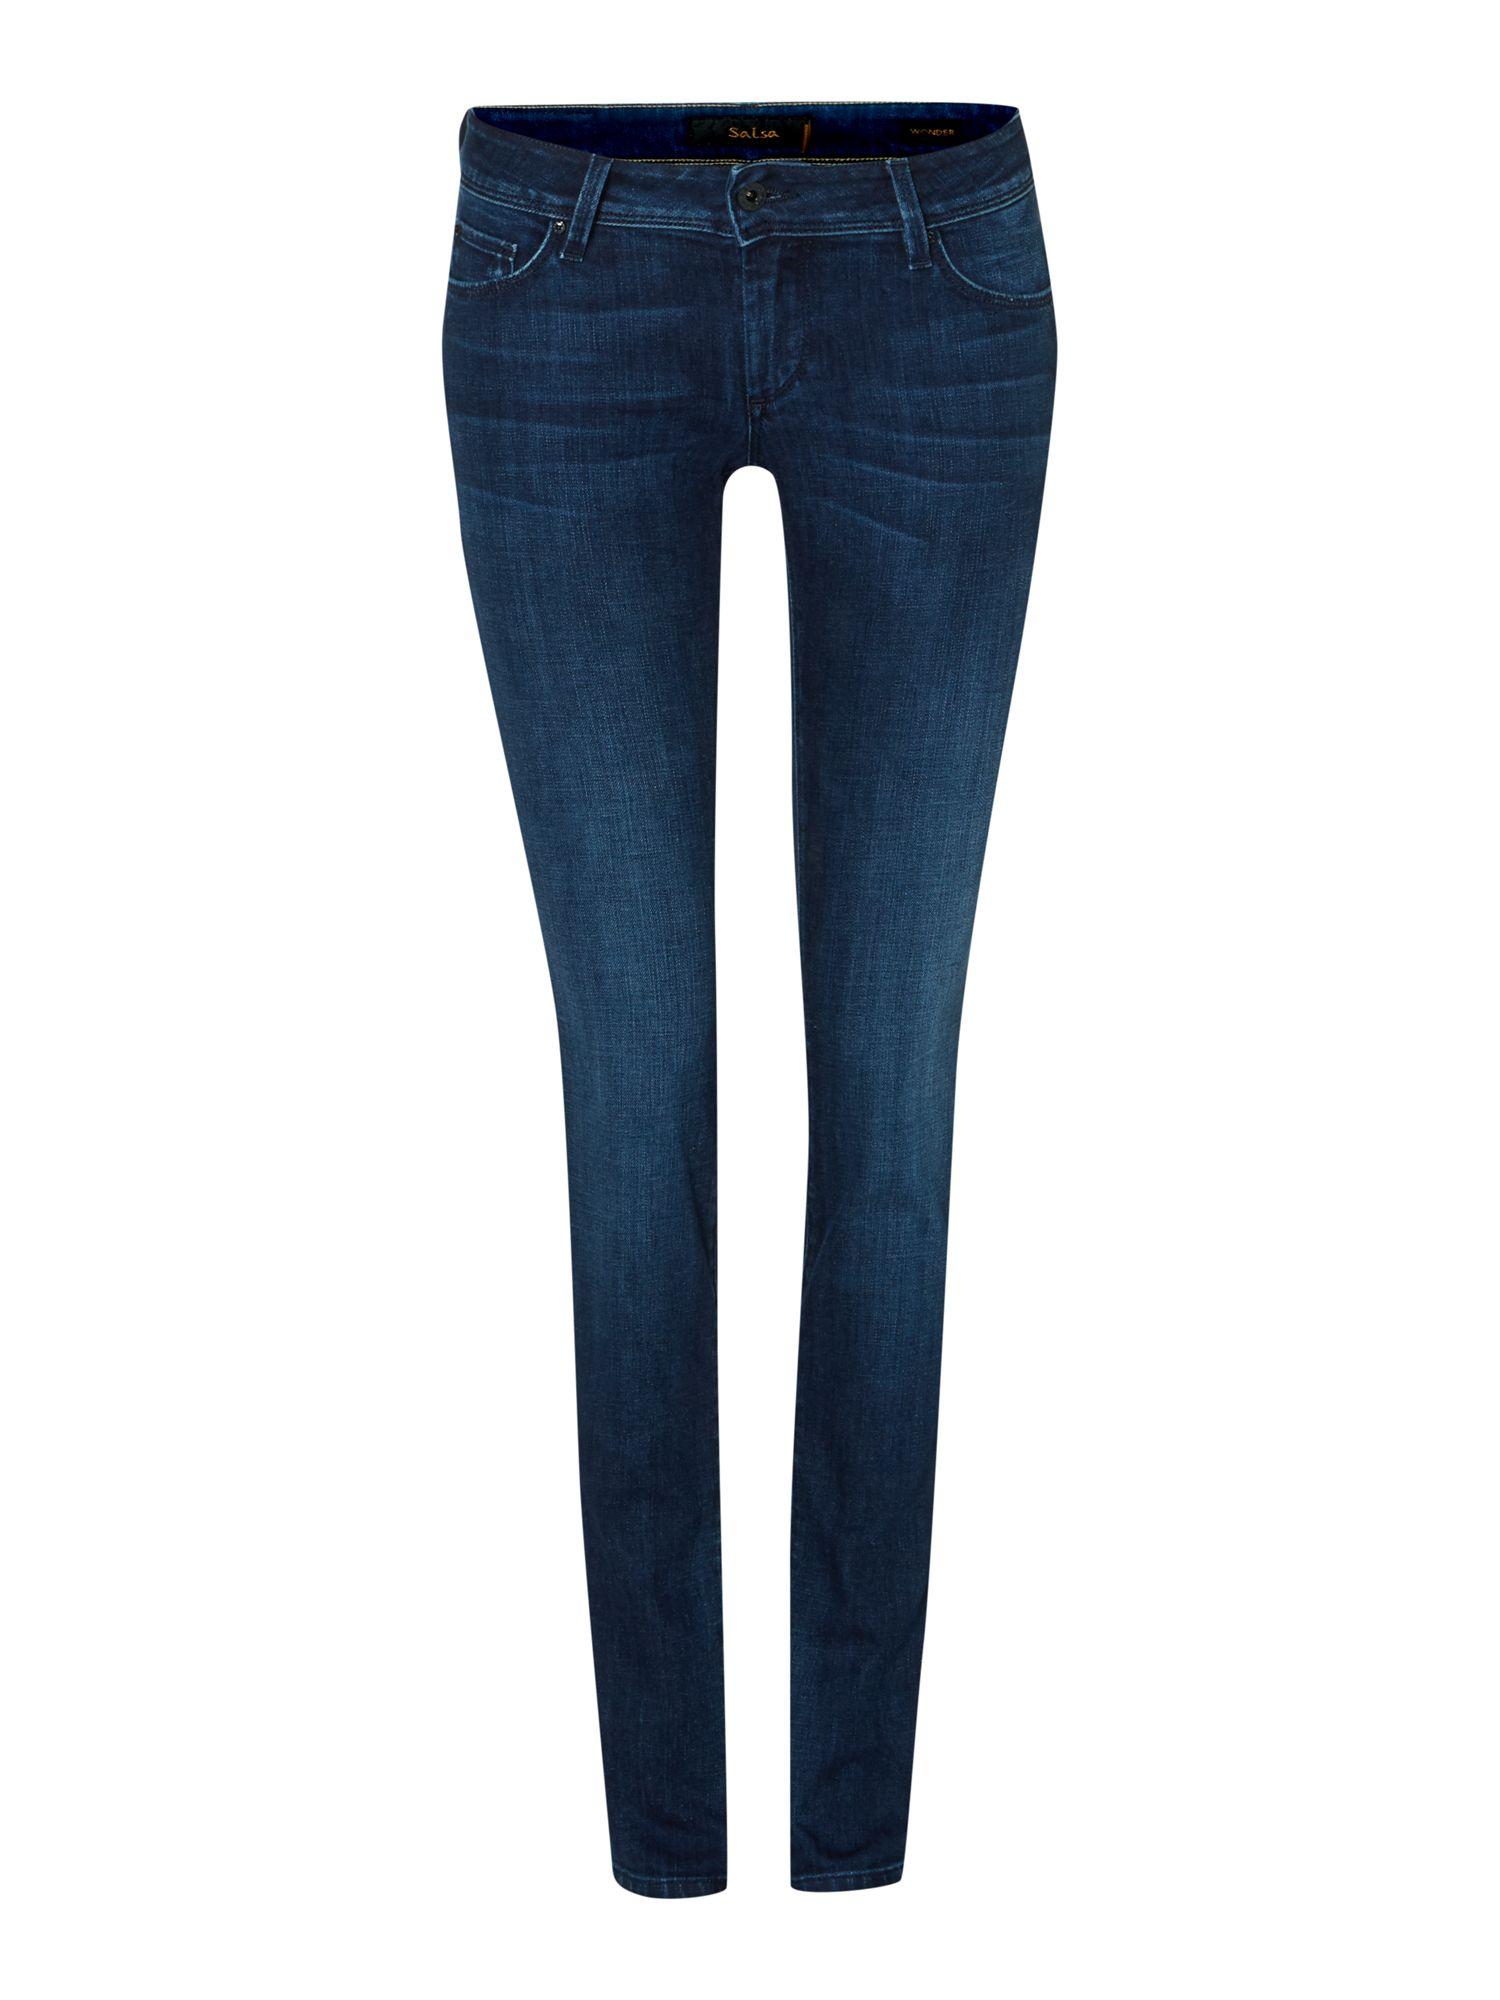 salsa wonder push up slim jeans in blue denim dark wash lyst. Black Bedroom Furniture Sets. Home Design Ideas